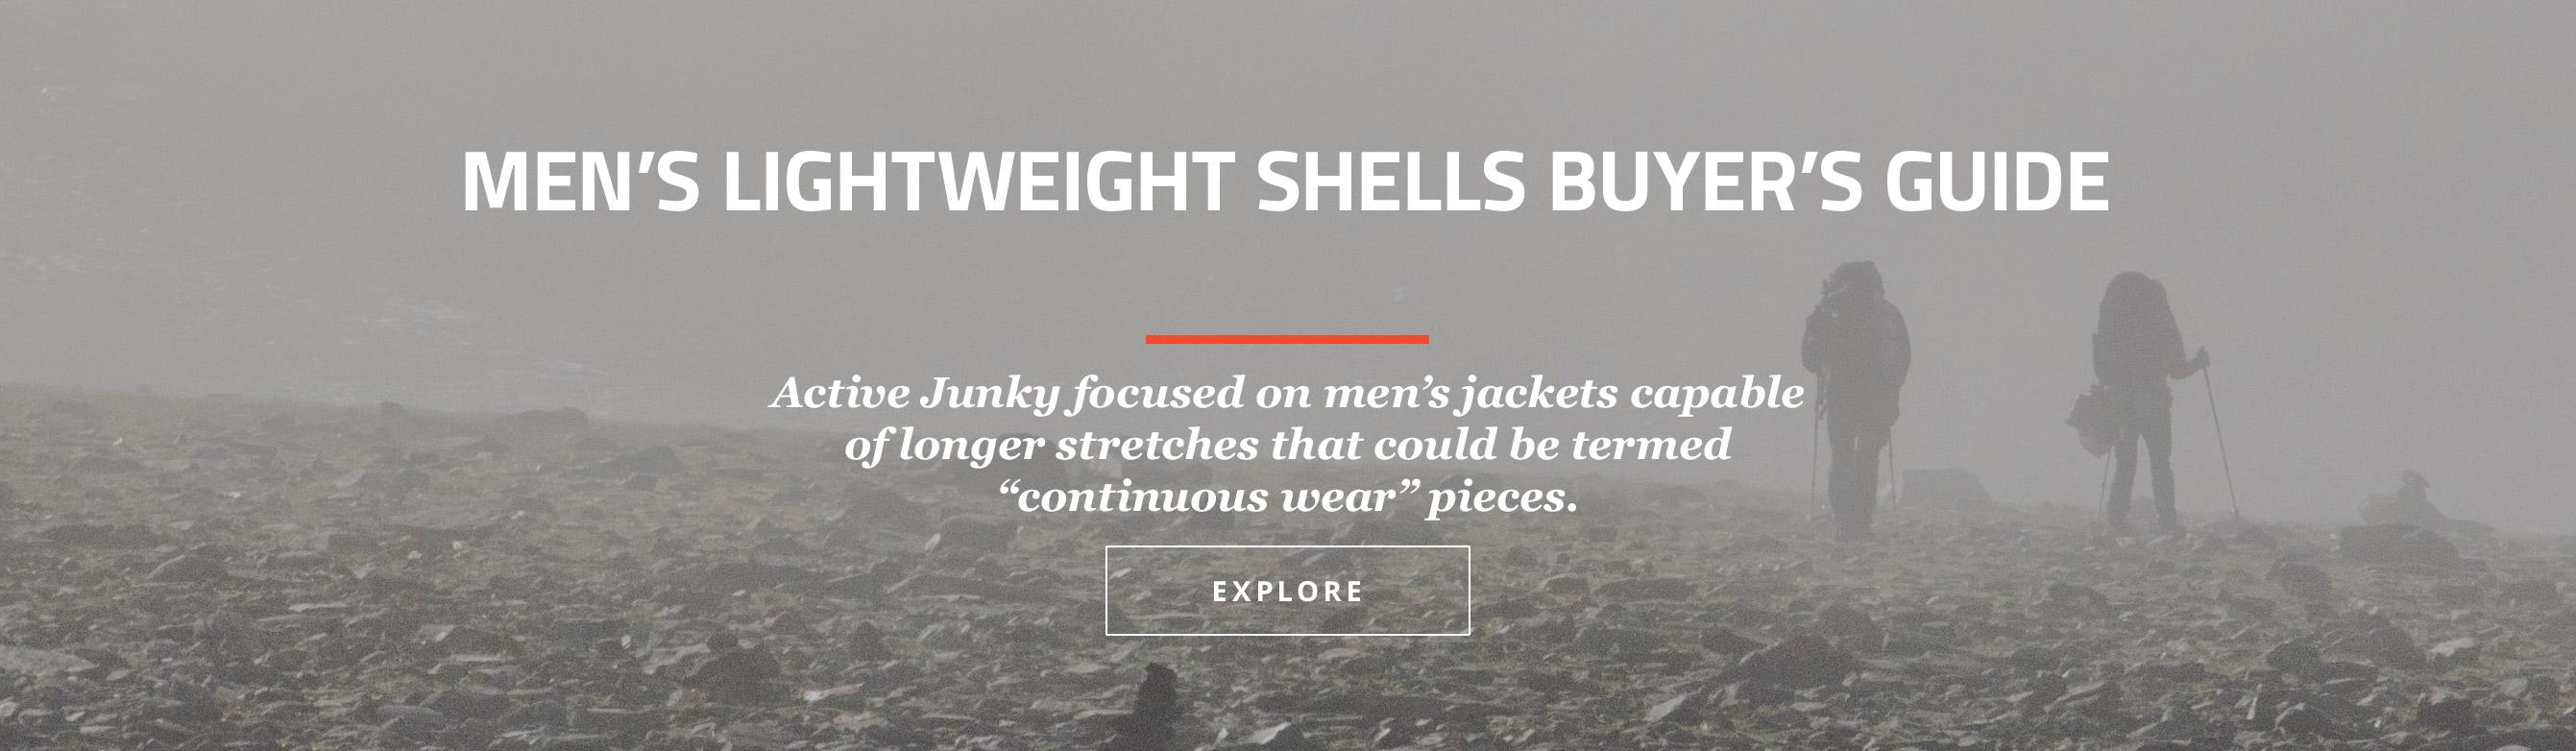 Men's Lighweight Shells Buyer's Guide